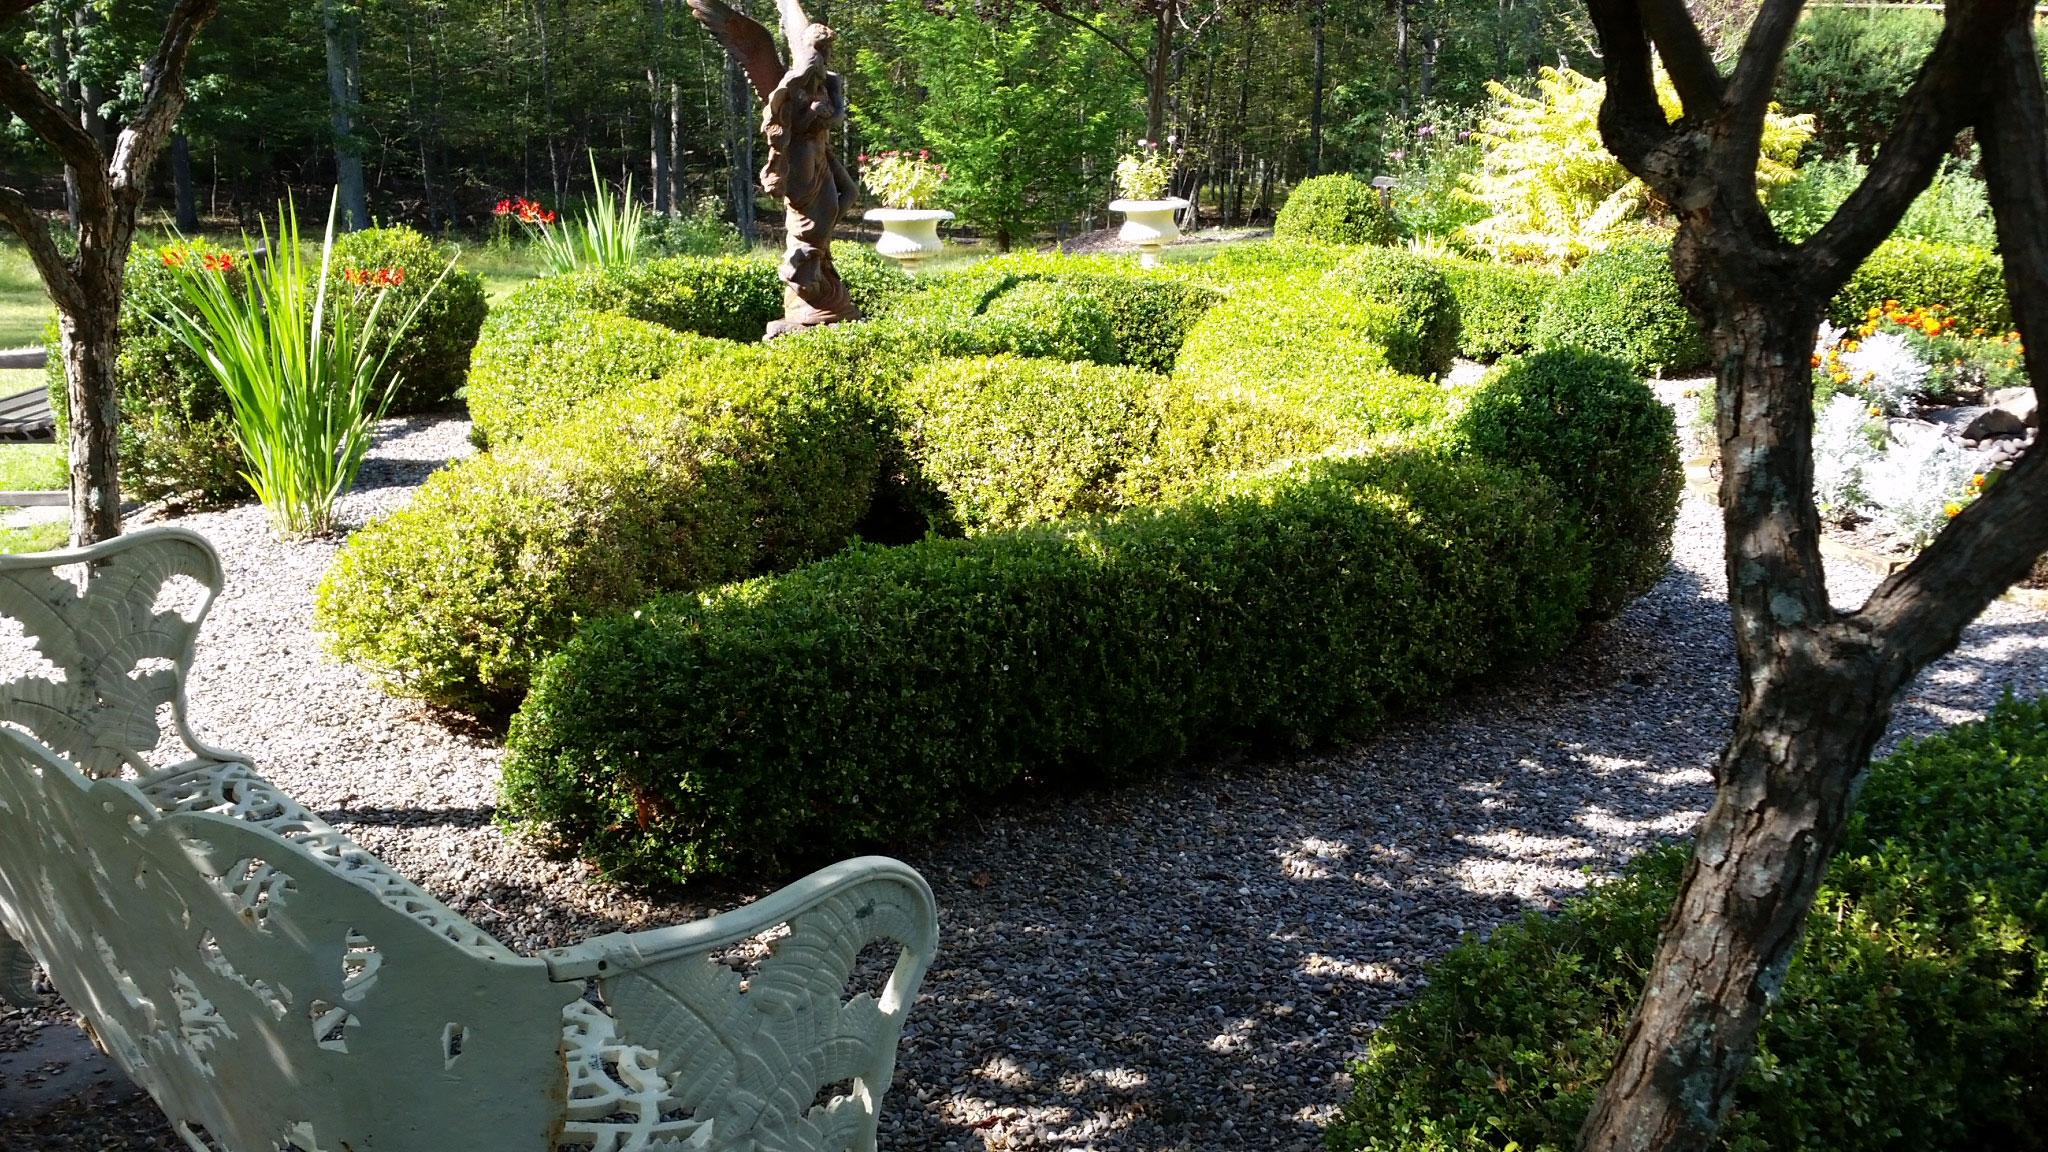 Landscape design landscape garden design in stone for Creative garden design 805